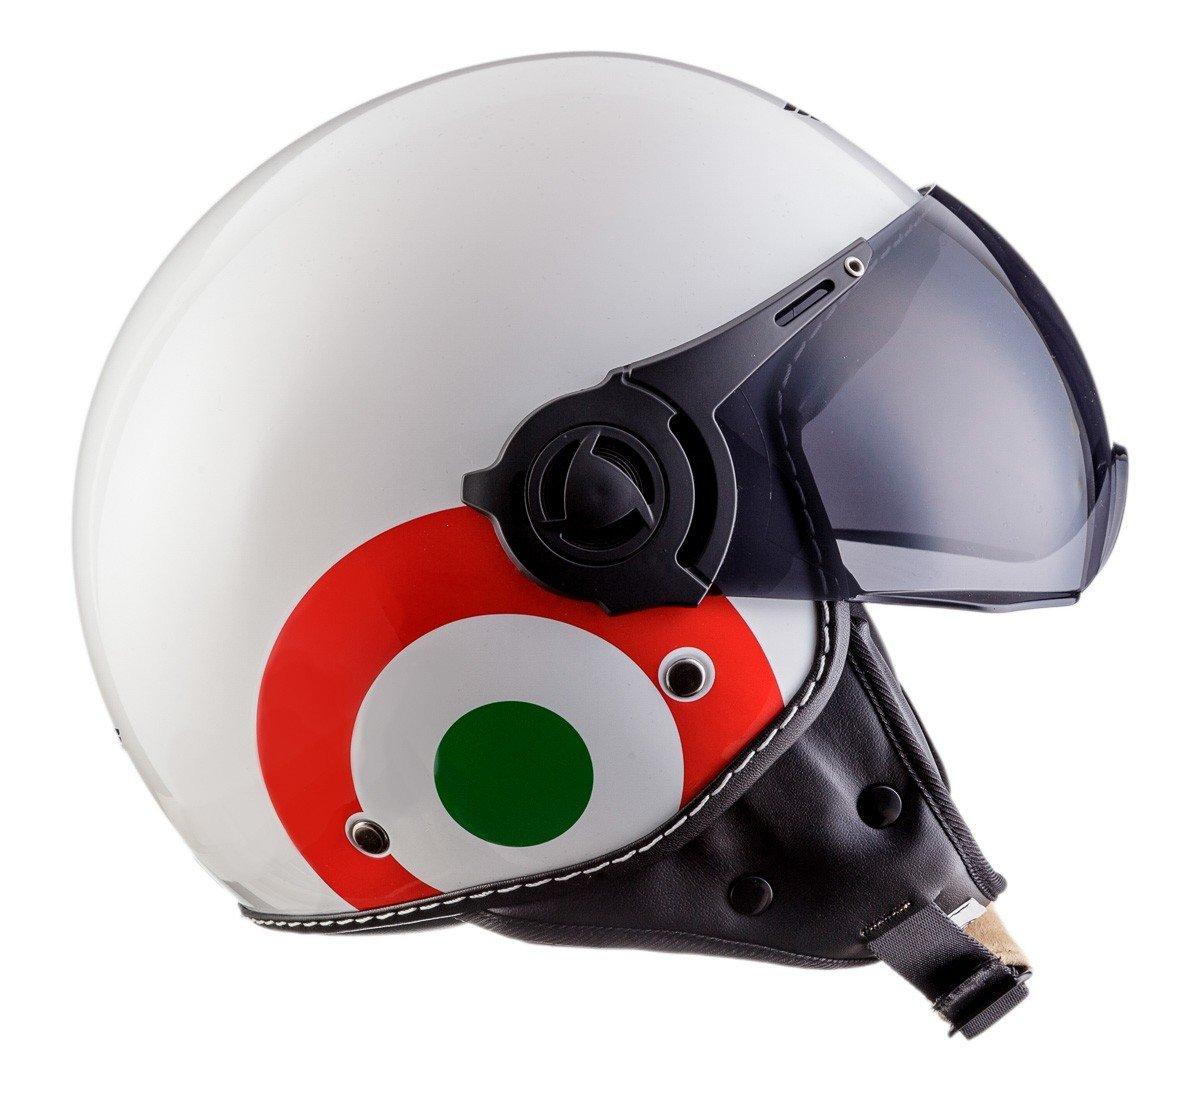 Noir Mat 57-58cm M Moto Helmets H44 Bobber Vintage Chopper Demi-Jet Helmet Scooter Chopper Pilot Retro Biker Vespa Moto Mofa Casque Jet Cruiser